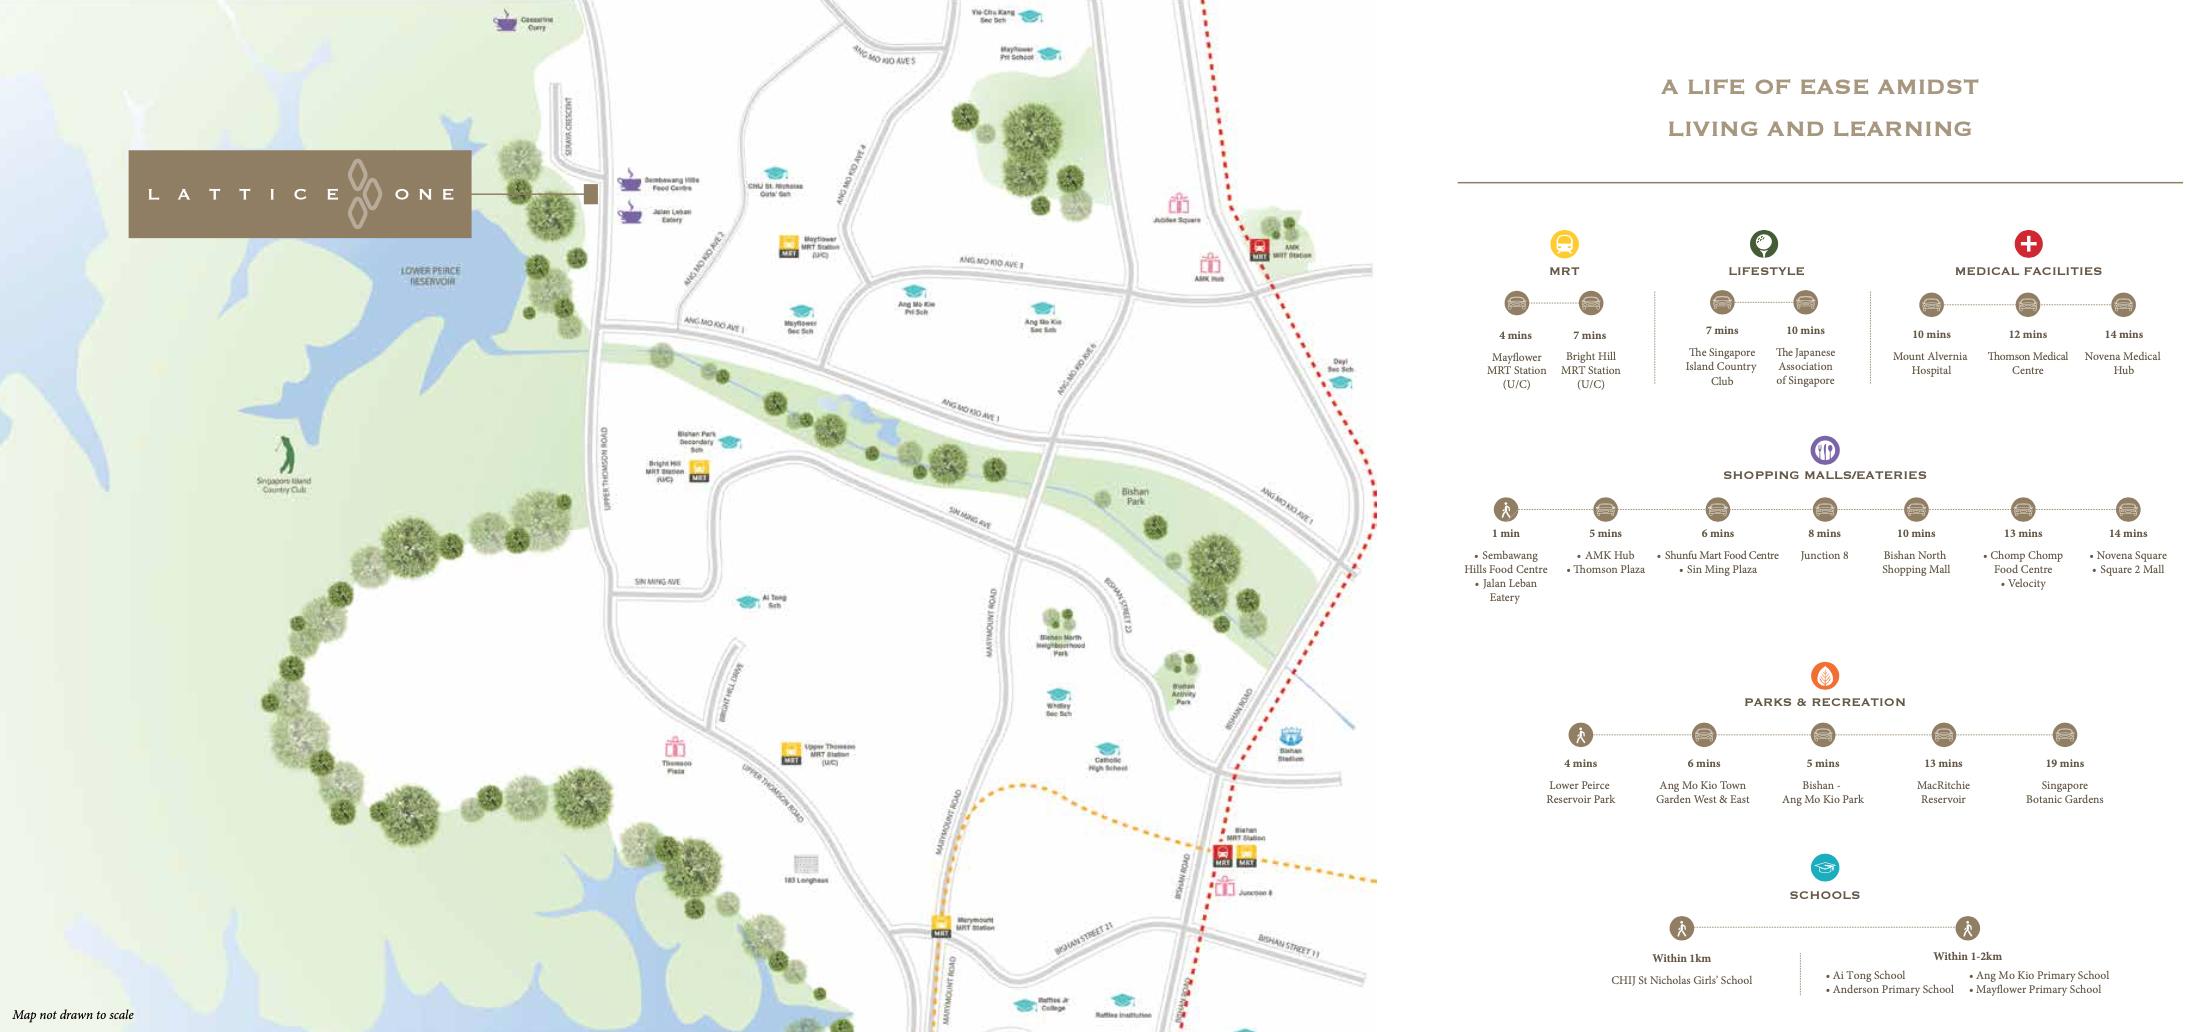 Lattice-One-new-condo-singapore-location-map